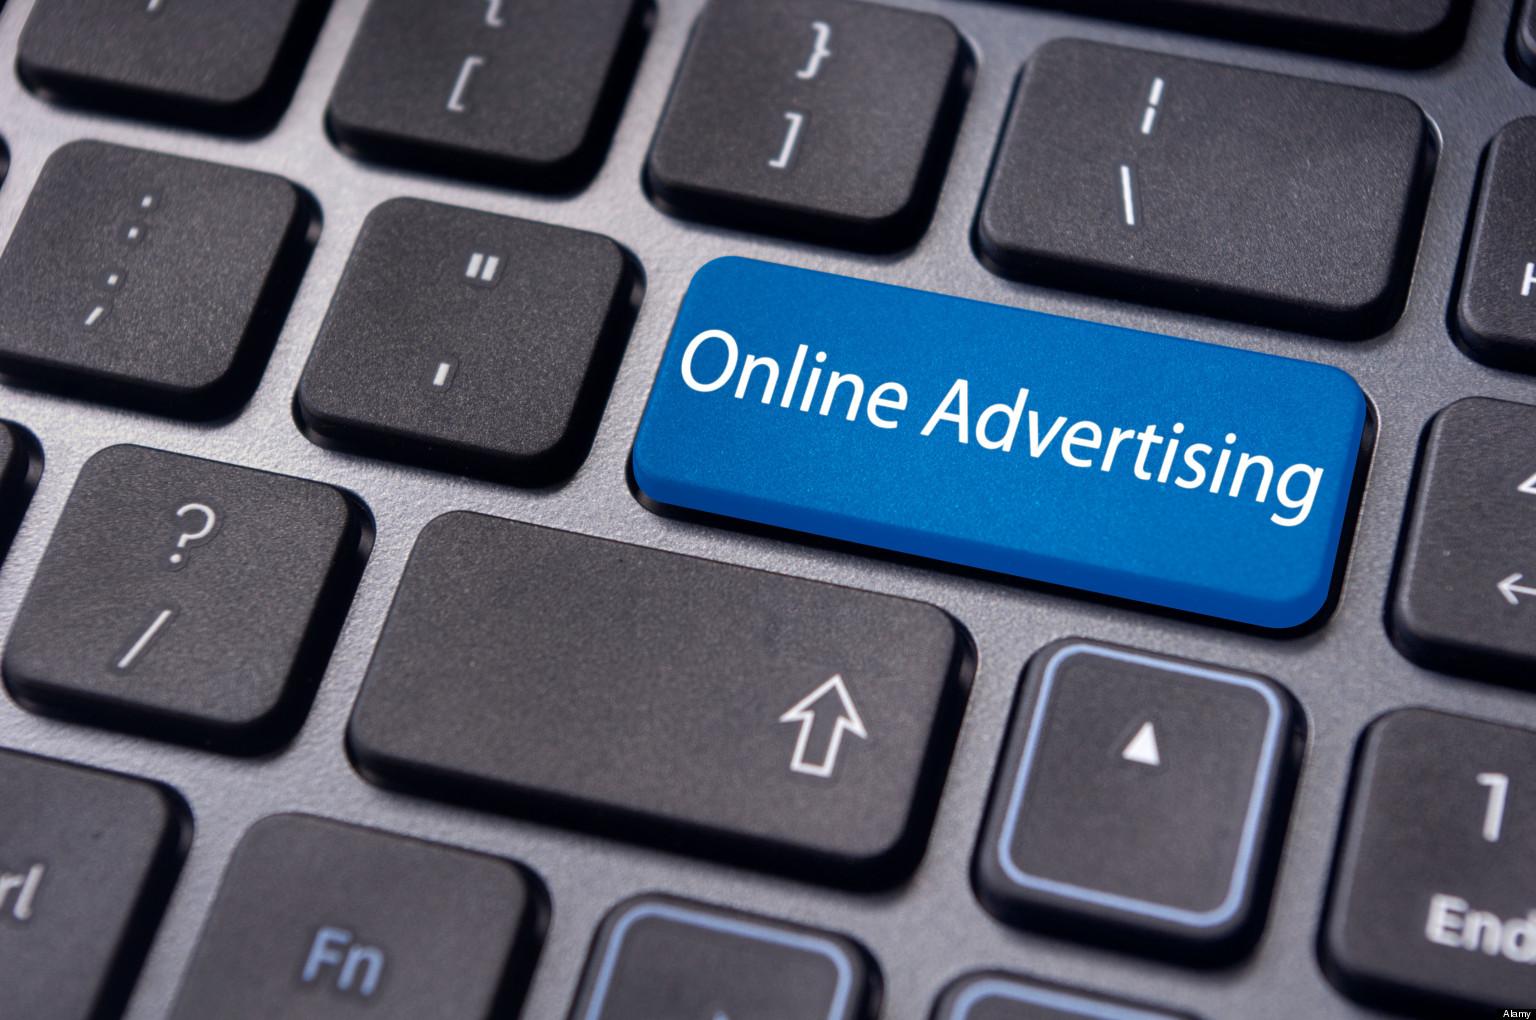 Care va fi evolutia publicitatii online in urmatorii ani